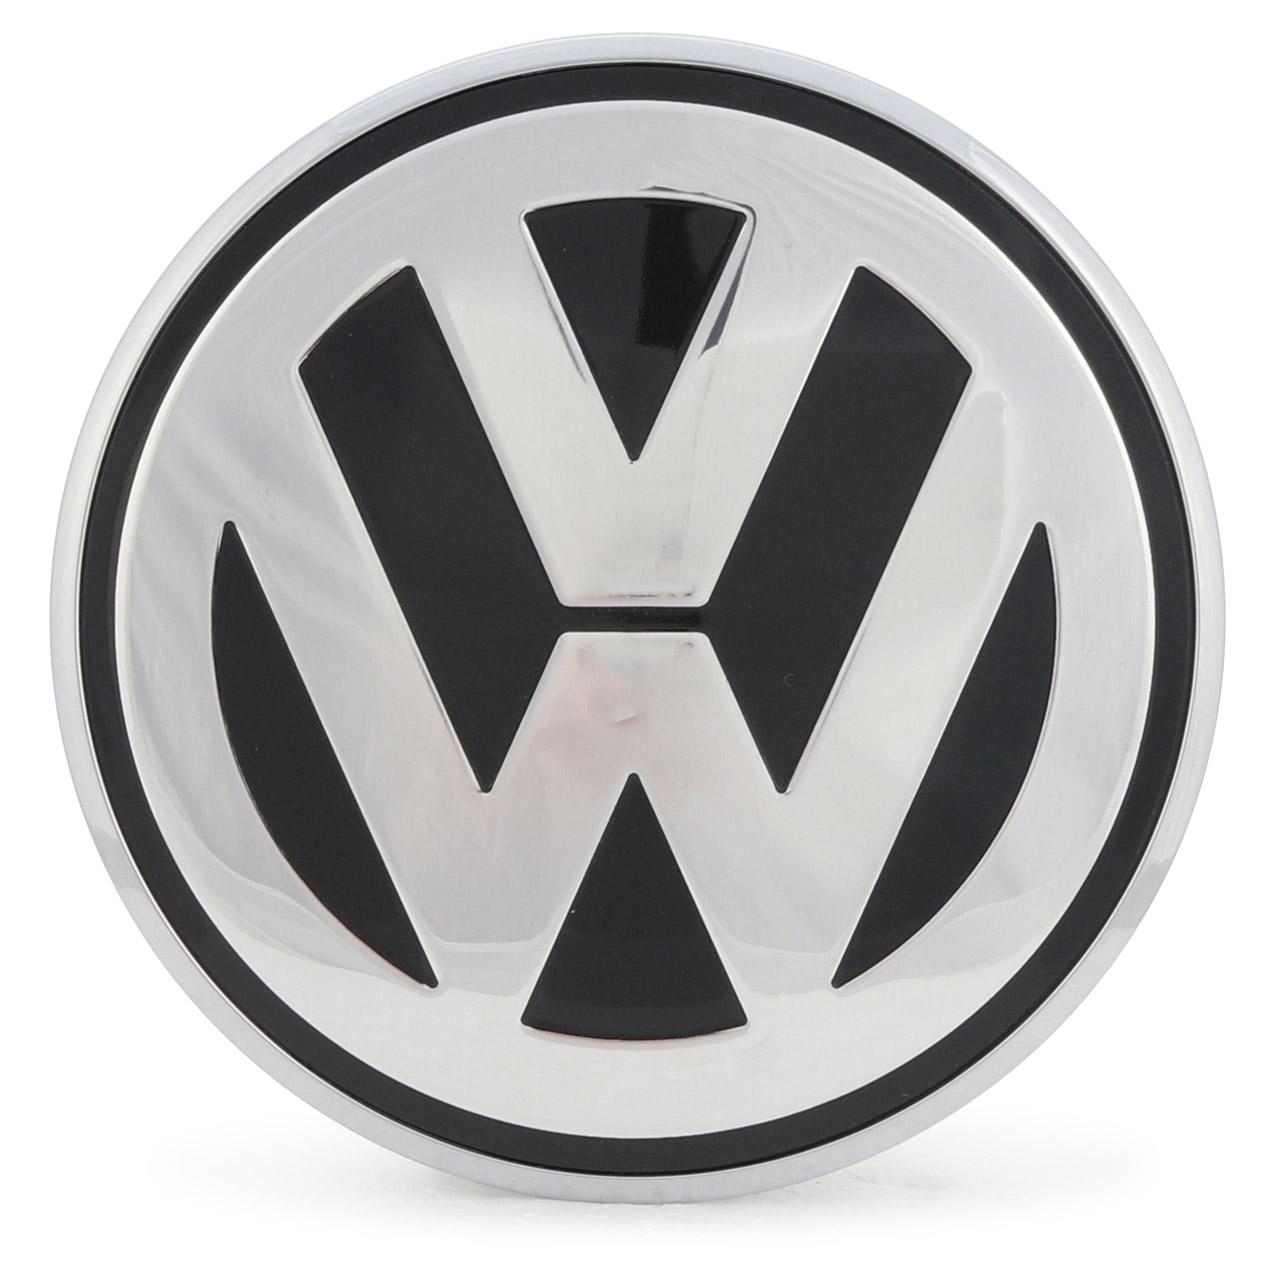 2x ORIGINAL VW CHROM Emblem Logo Motorhaube + Heckklappe New Beetle bis 2005